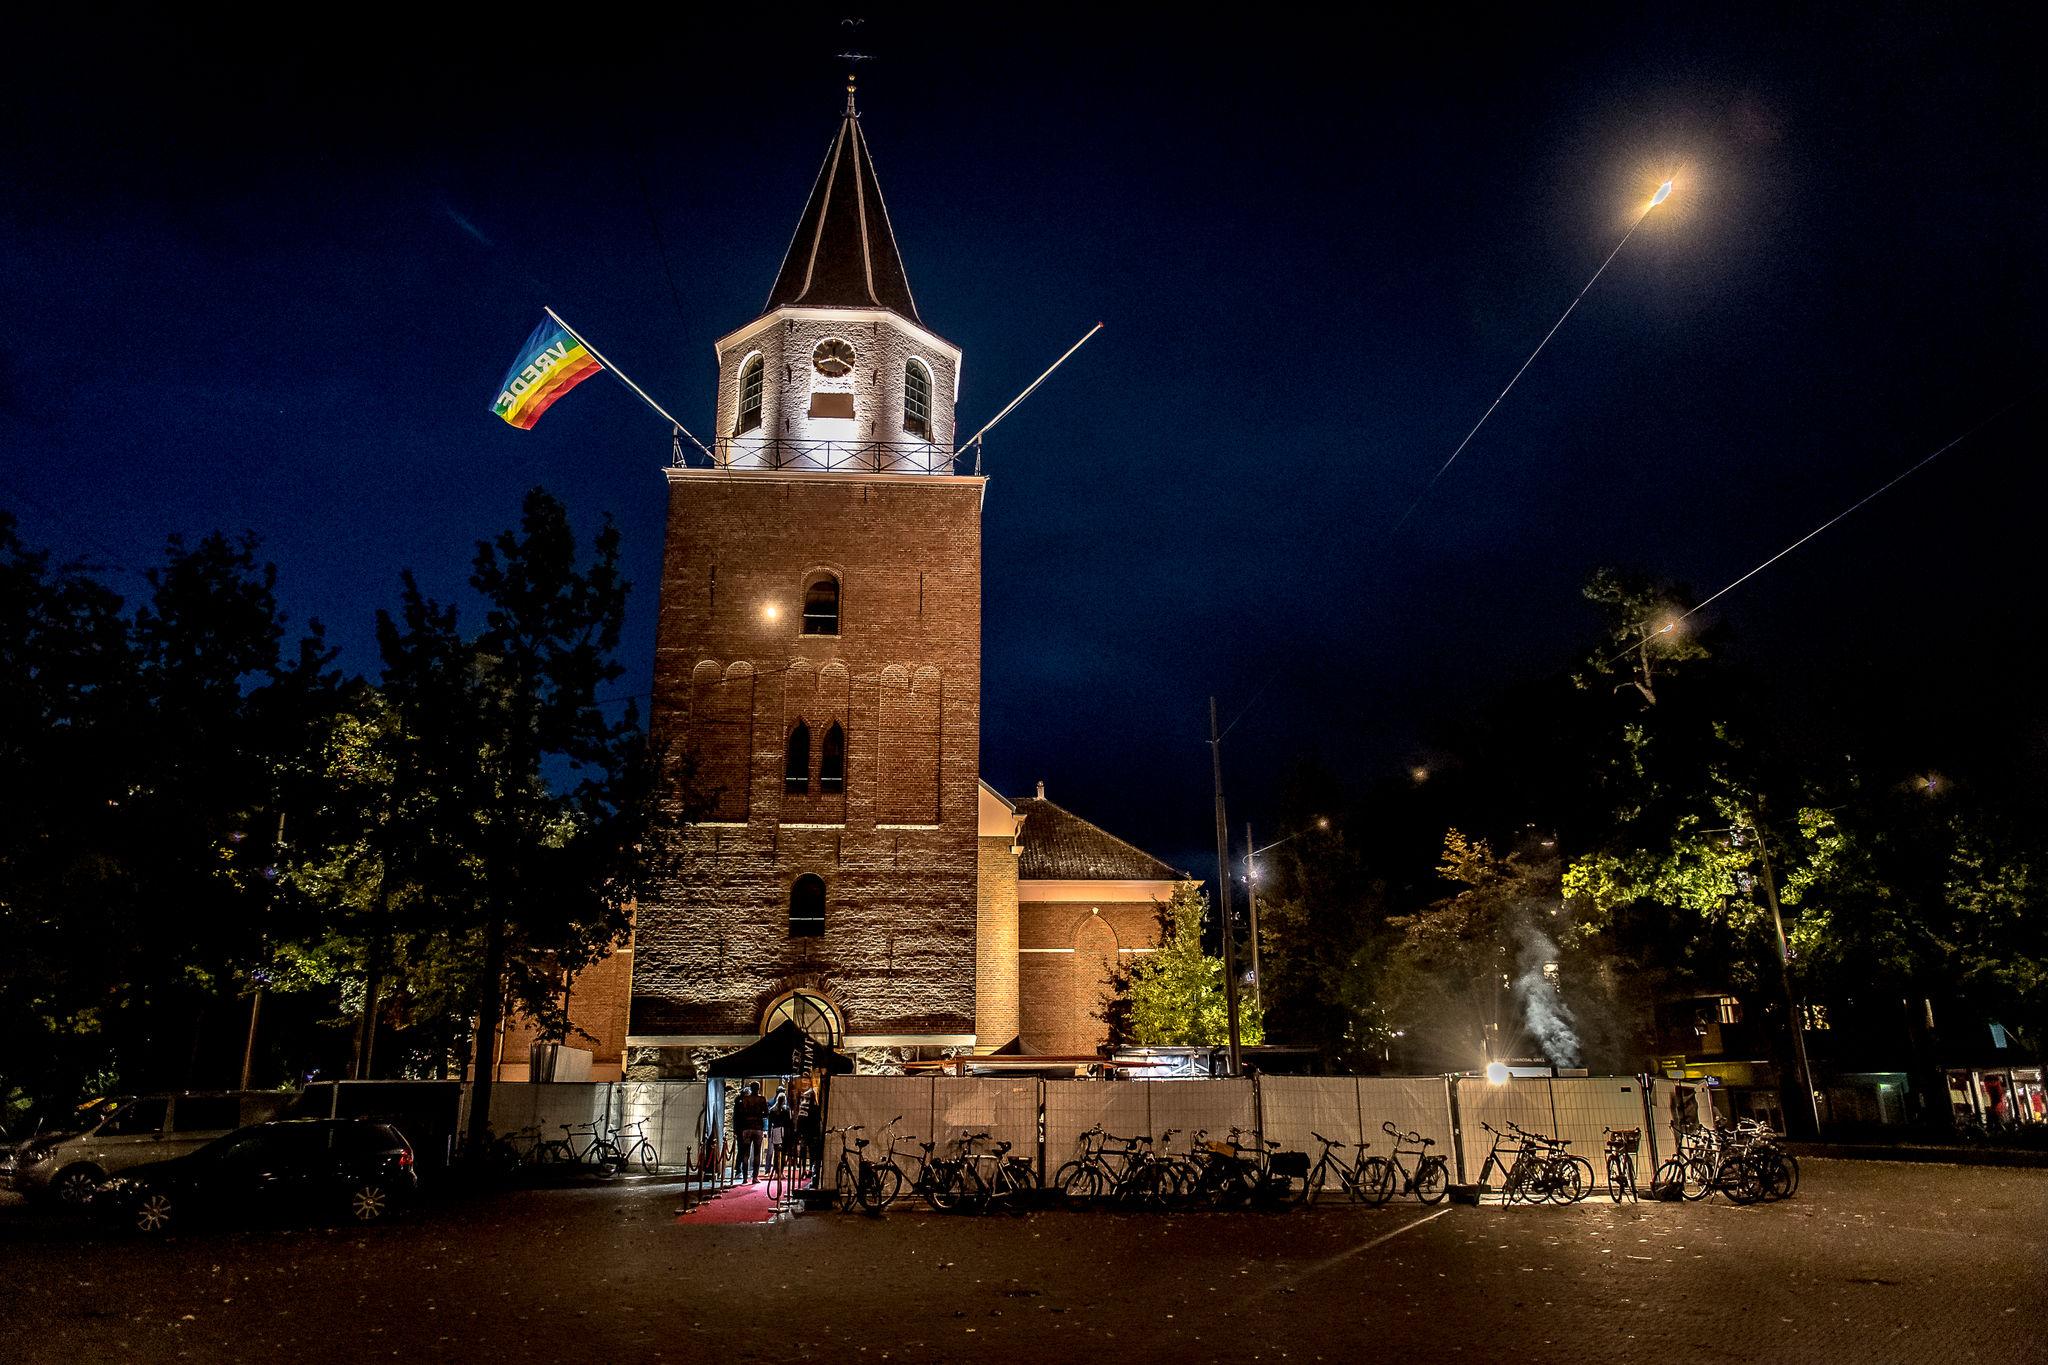 https://bierfestivalemmen.nl/wp-content/uploads/2019/02/hulskers.nl_026_print_3191.jpg